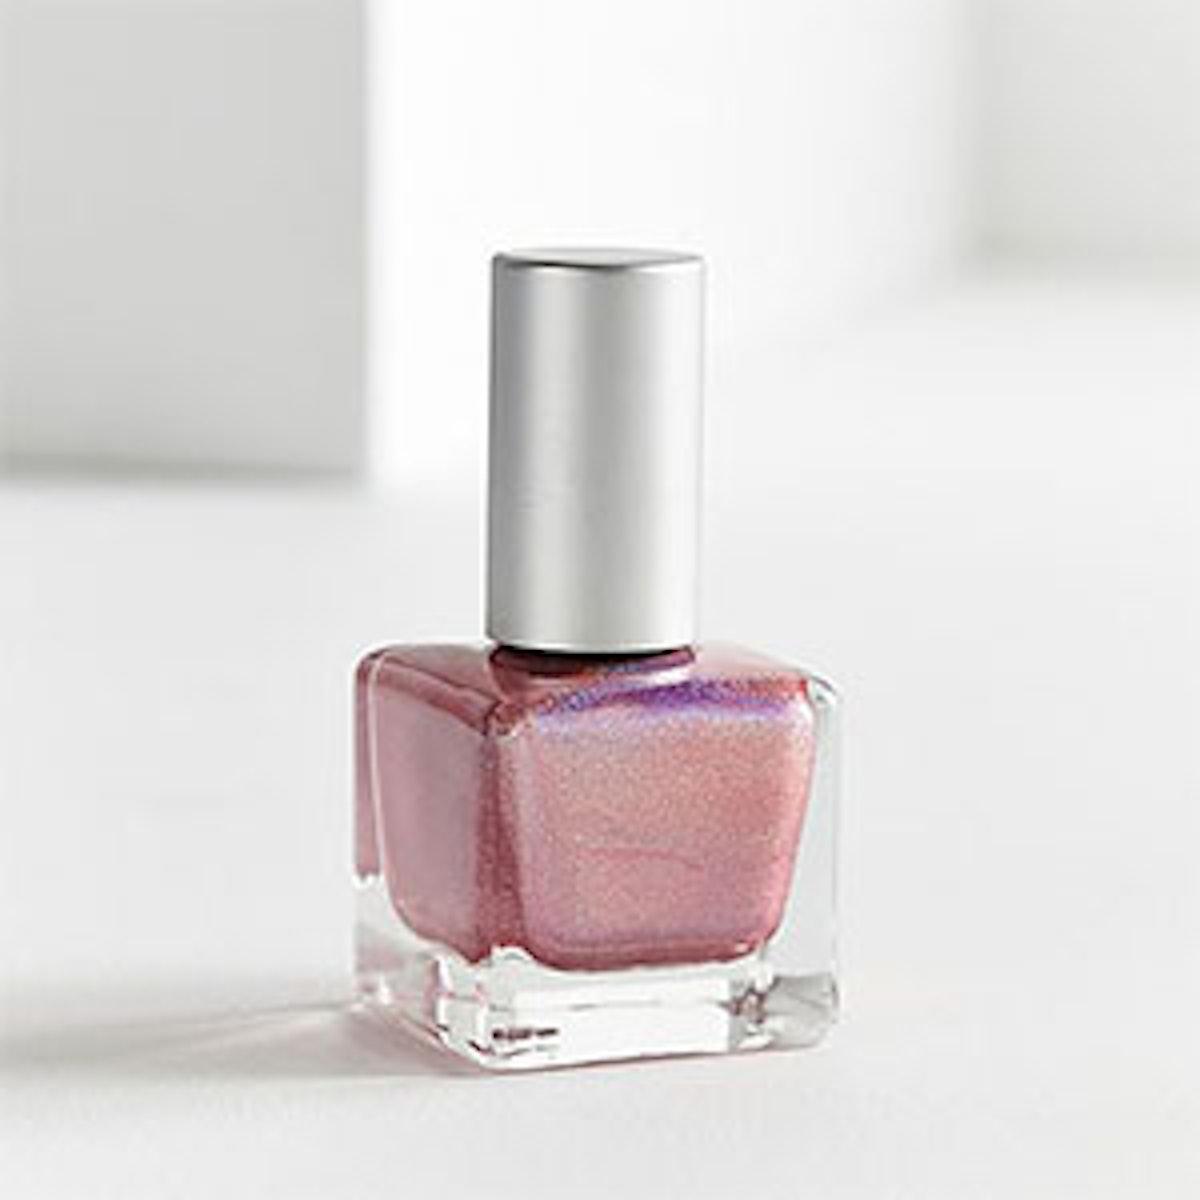 Sparkle Collection Nail Polish In Metallic Rose